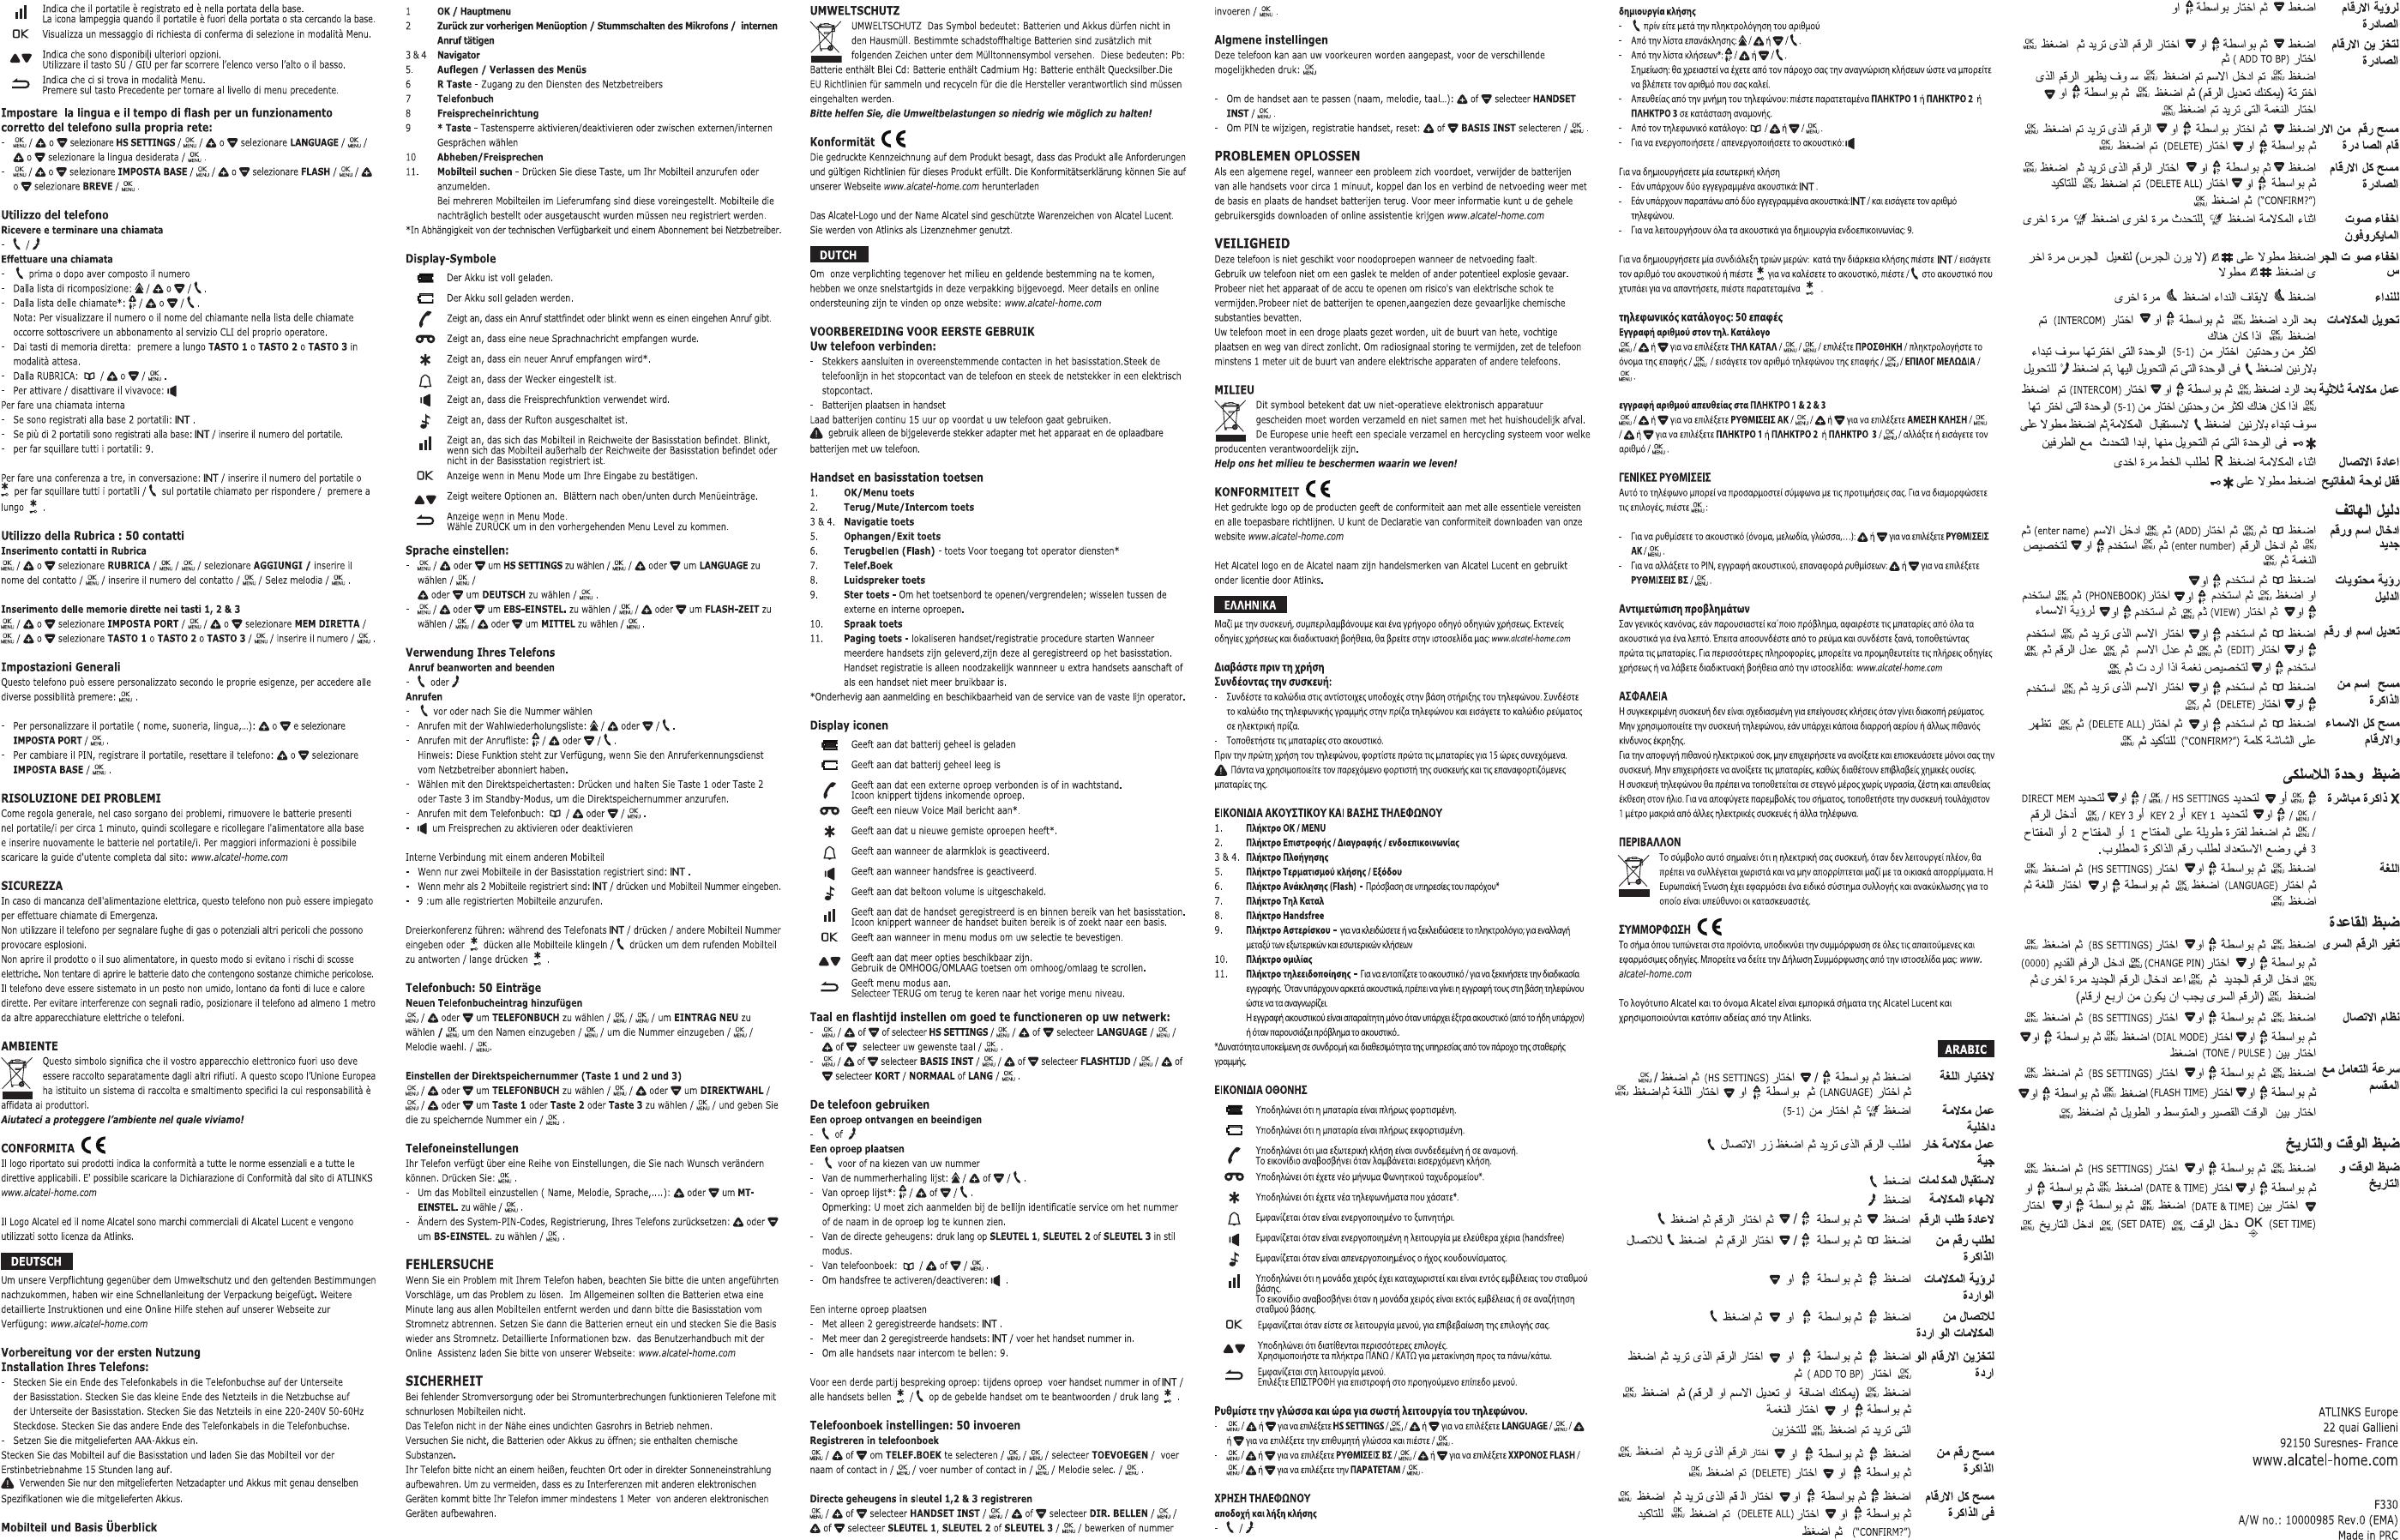 Manual Alcatel F330 (page 2 of 2) (German, English